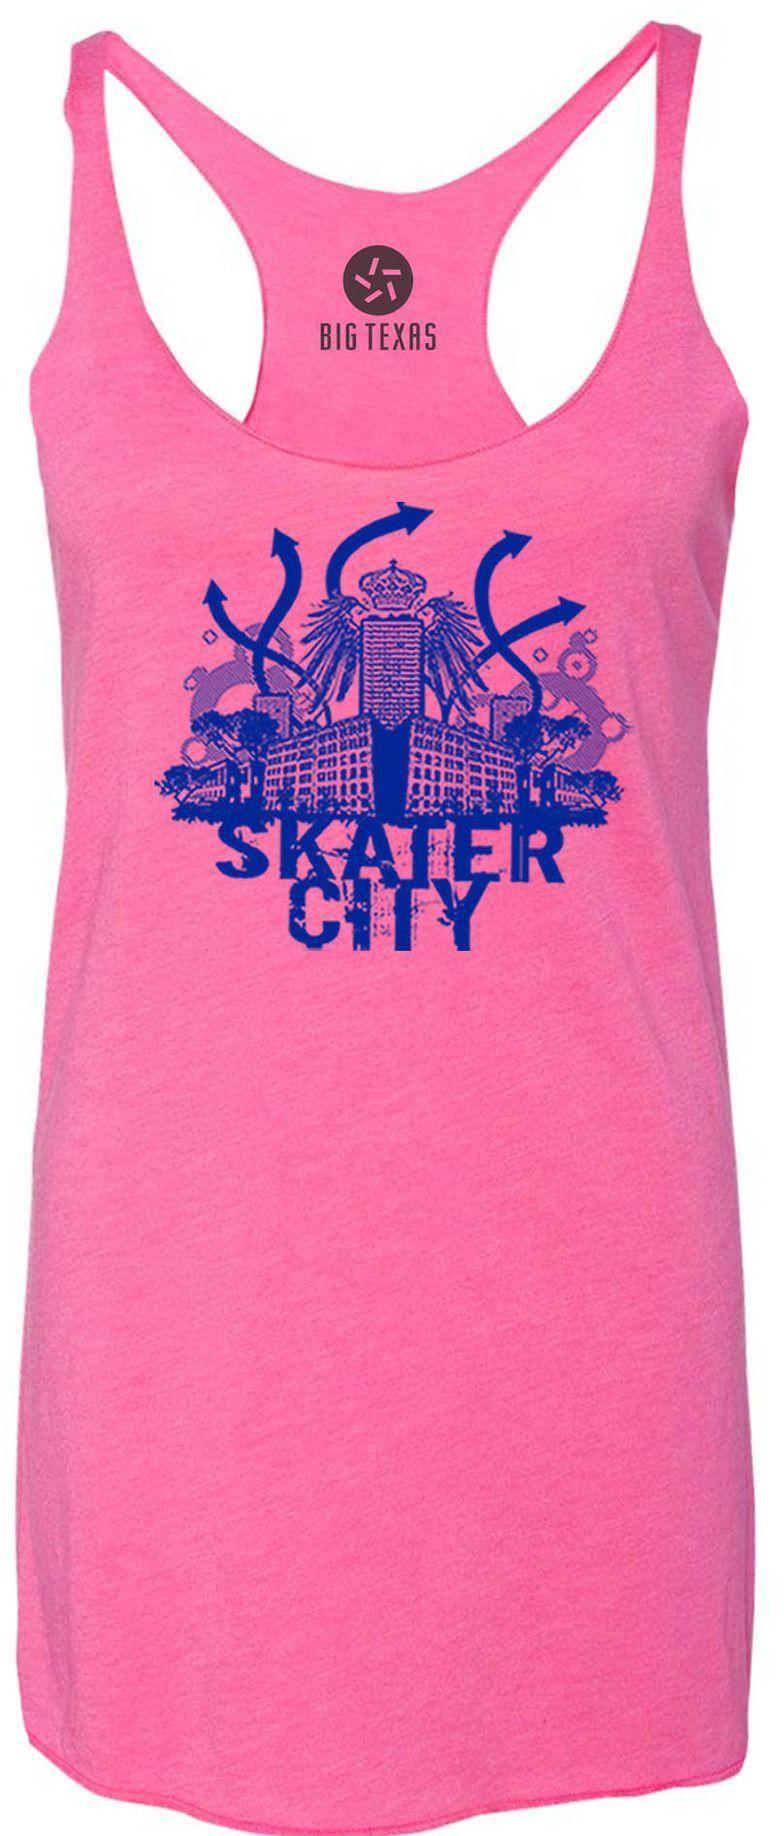 Skater City (Blue) Tri-Blend Racerback Tank-Top